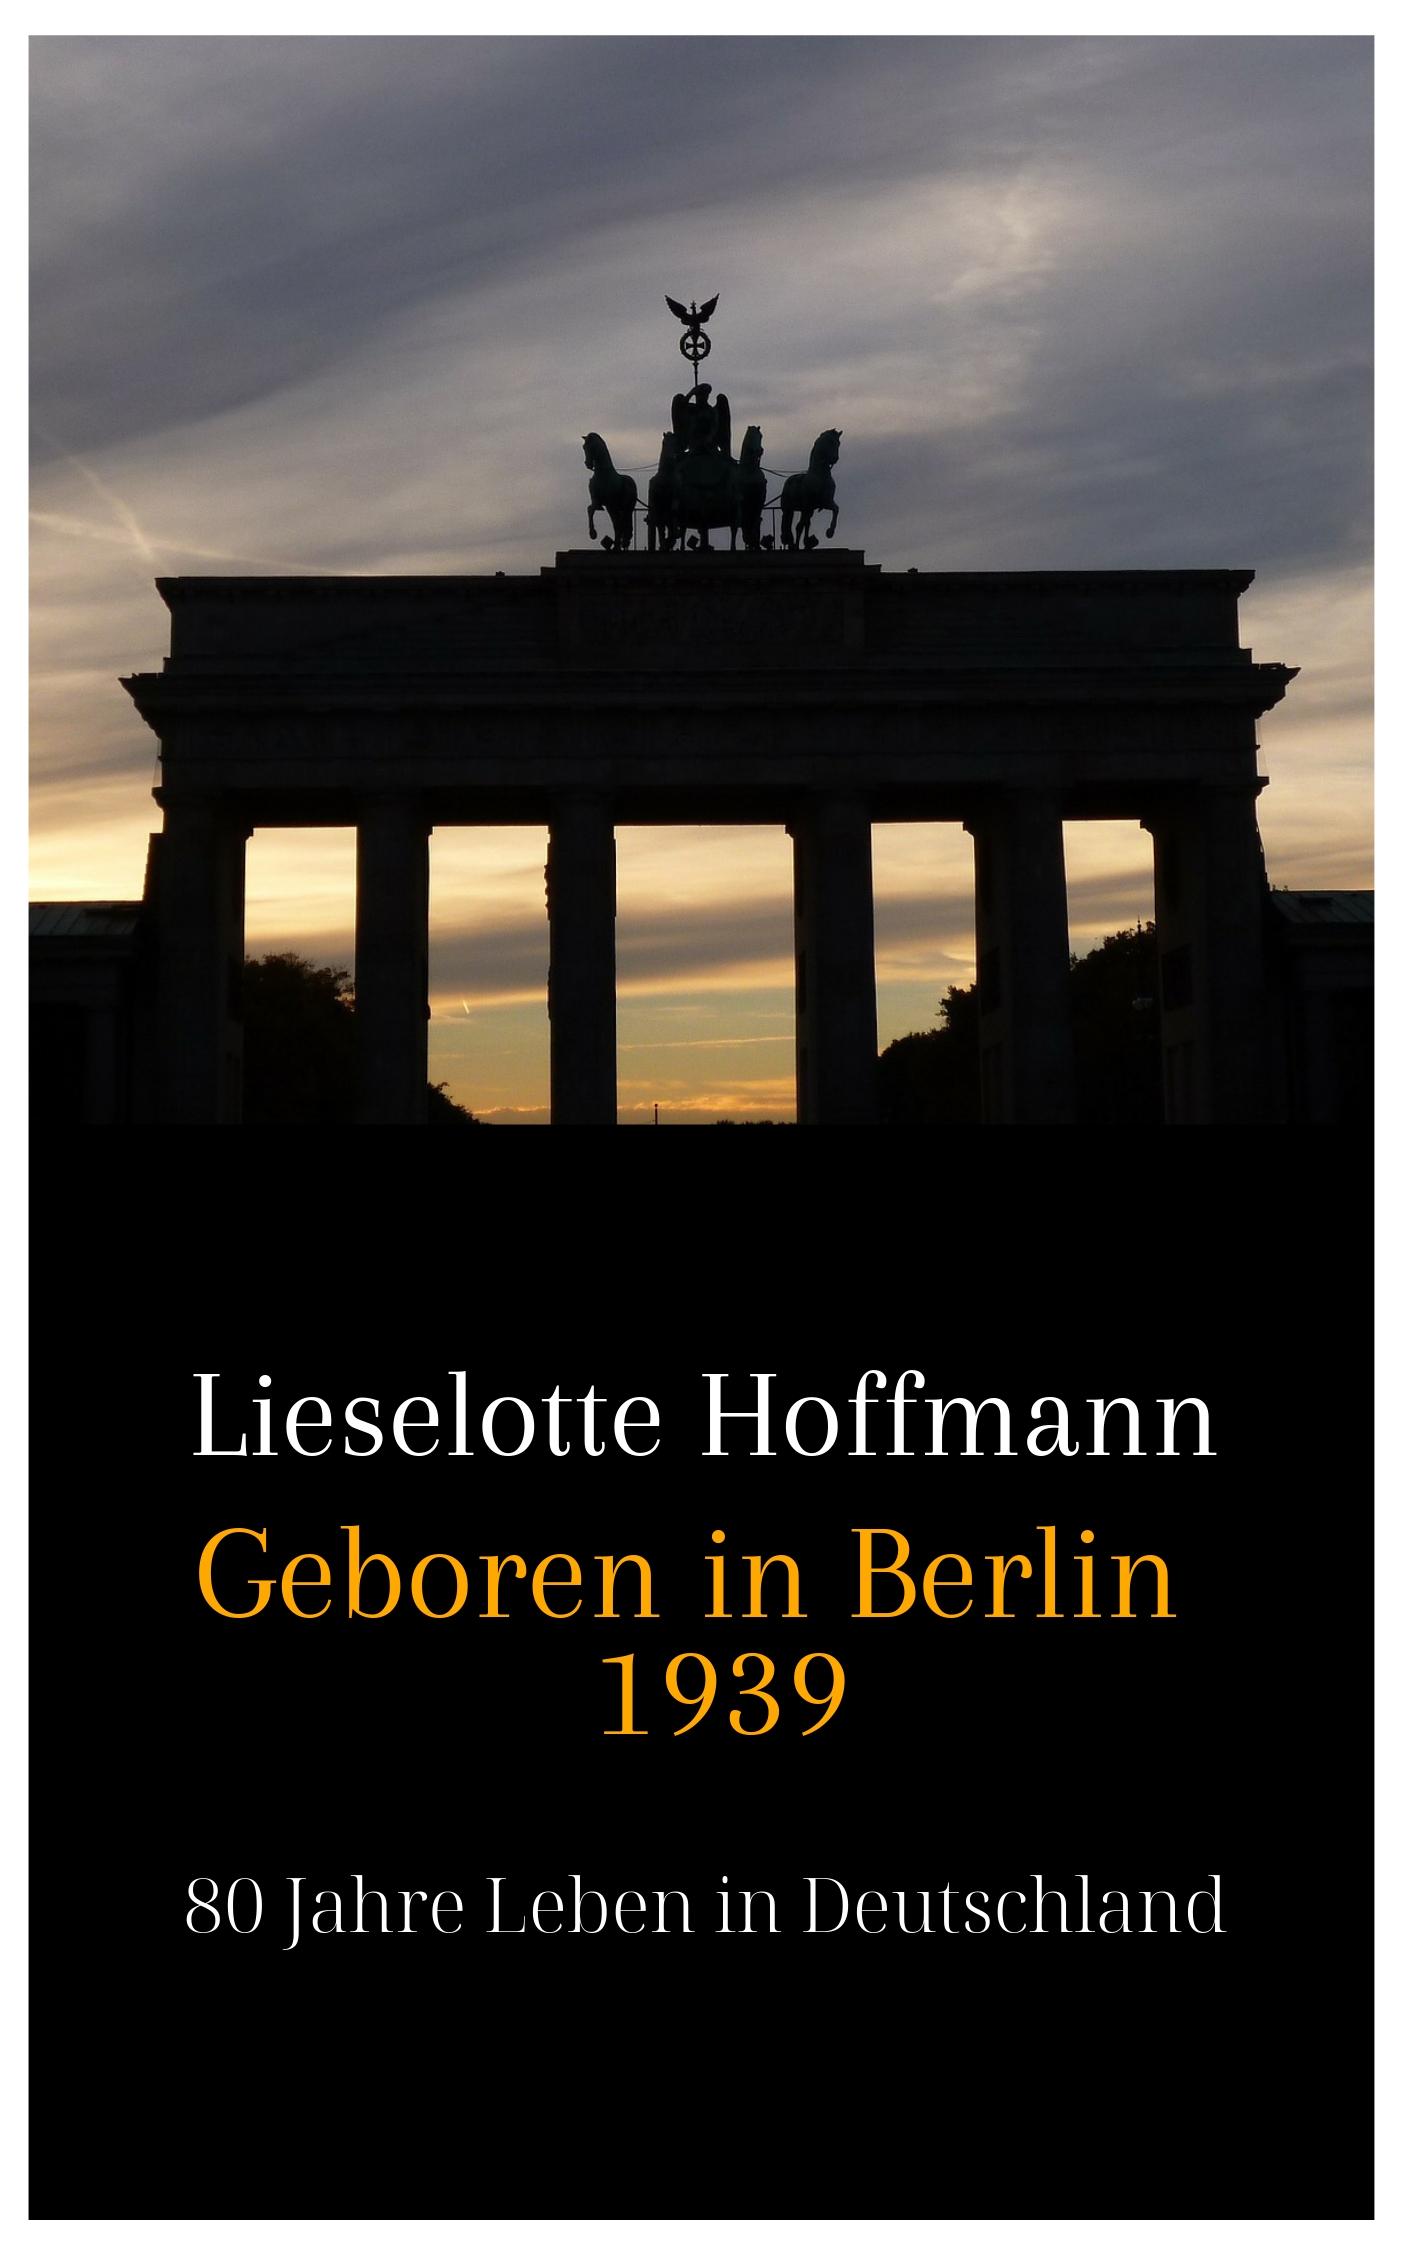 Geboren in Berlin 1939 - Lieselotte Hoffmann